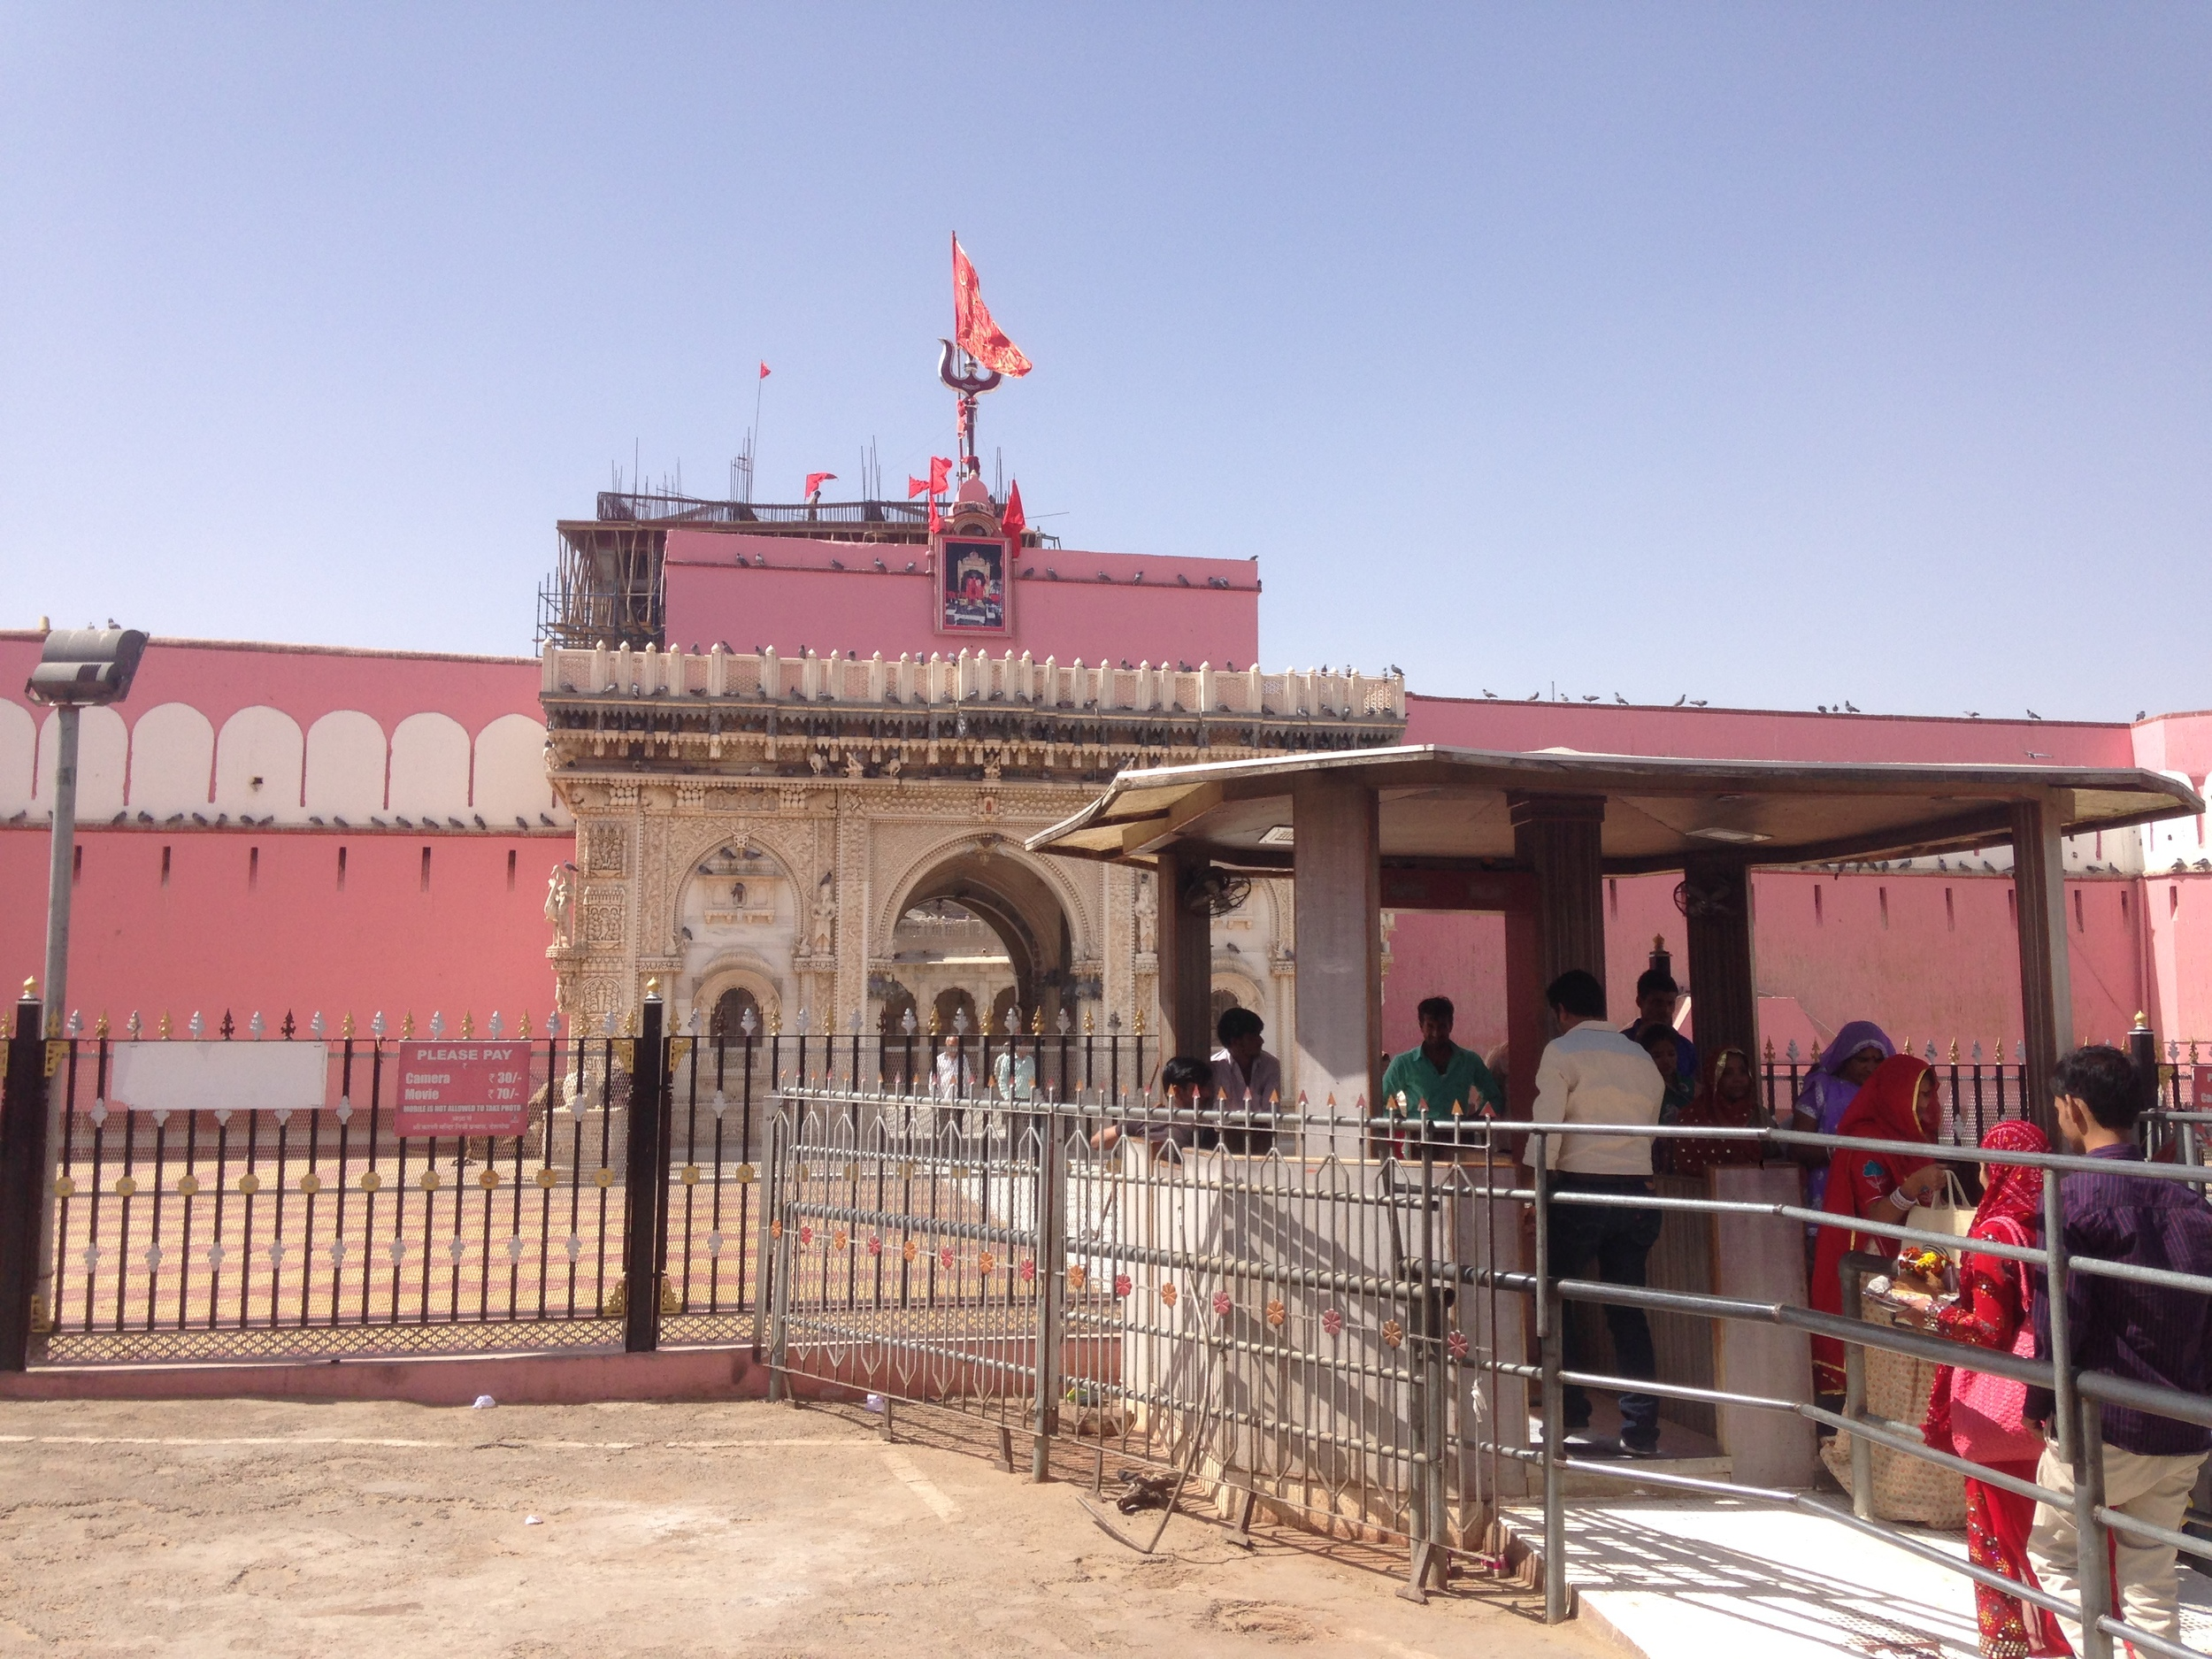 Entrance to the Karni Mata Temple